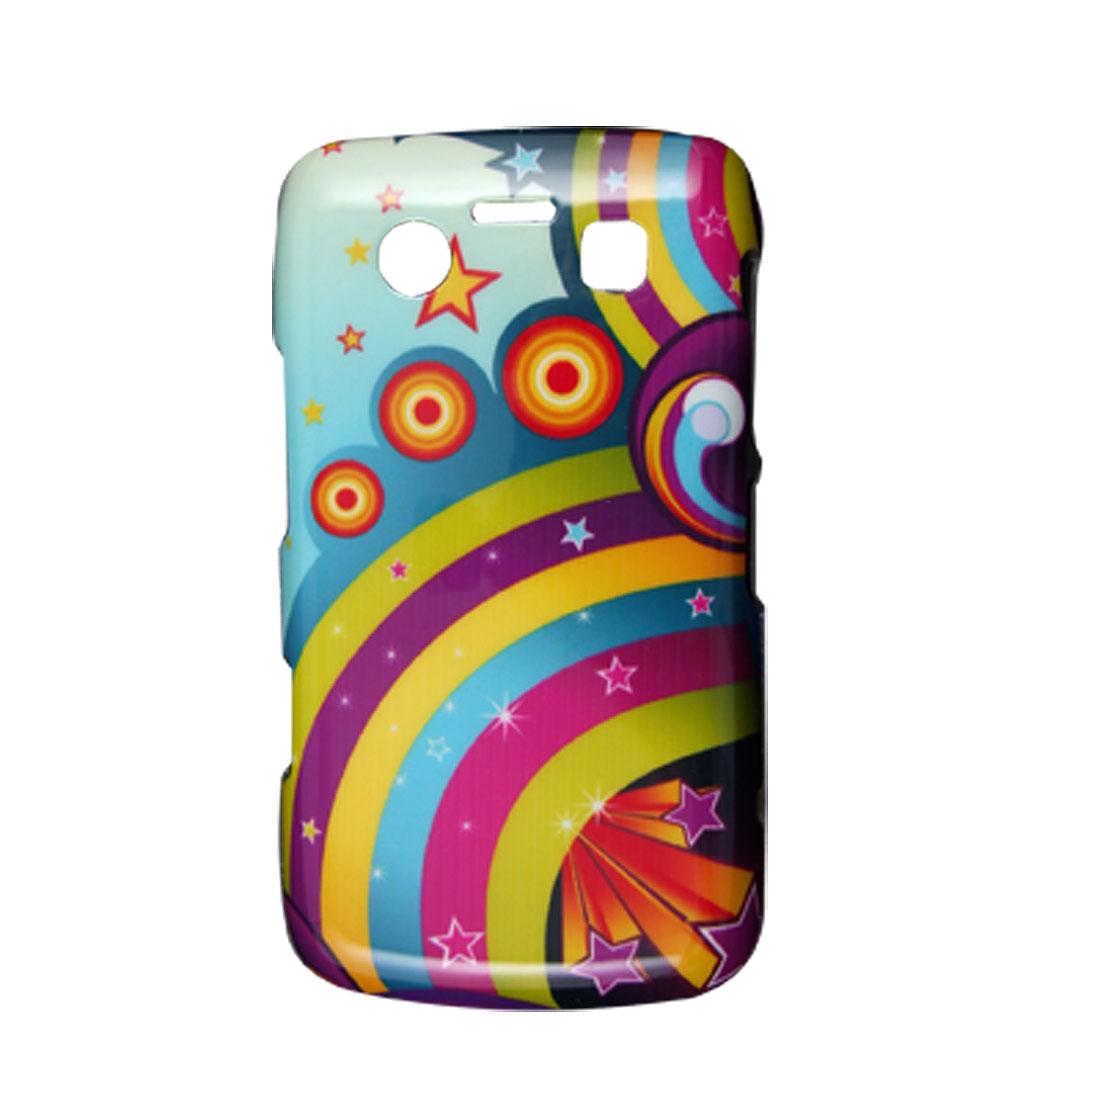 Colorful Printed Hard Plastic Back Case for Blackberry 9700 9020